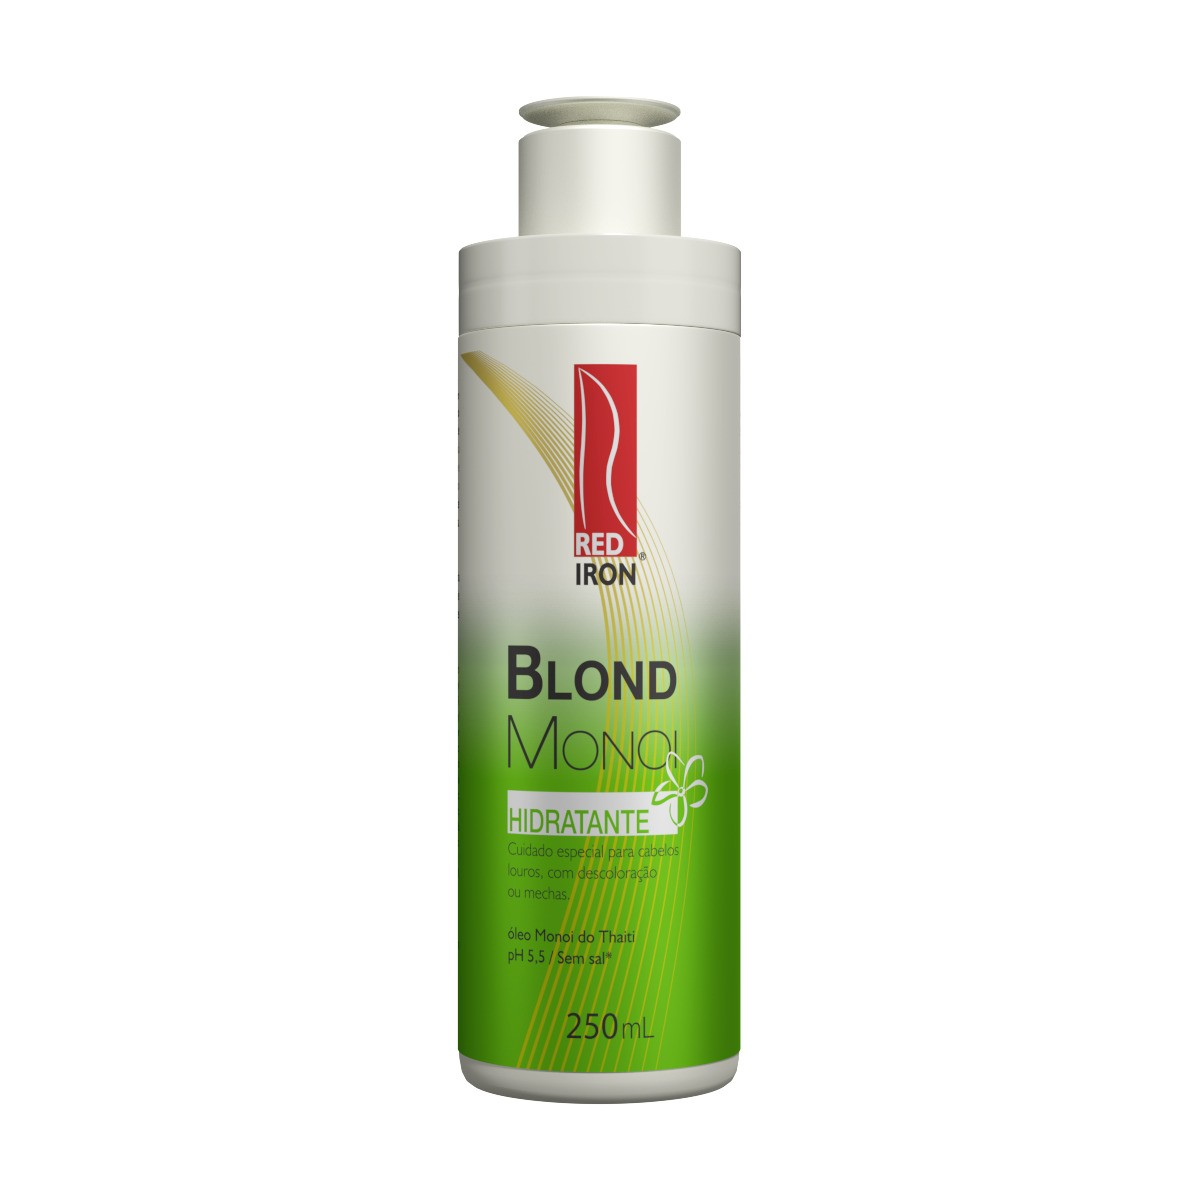 Red Iron Hidratante Blond Monoi 250ml